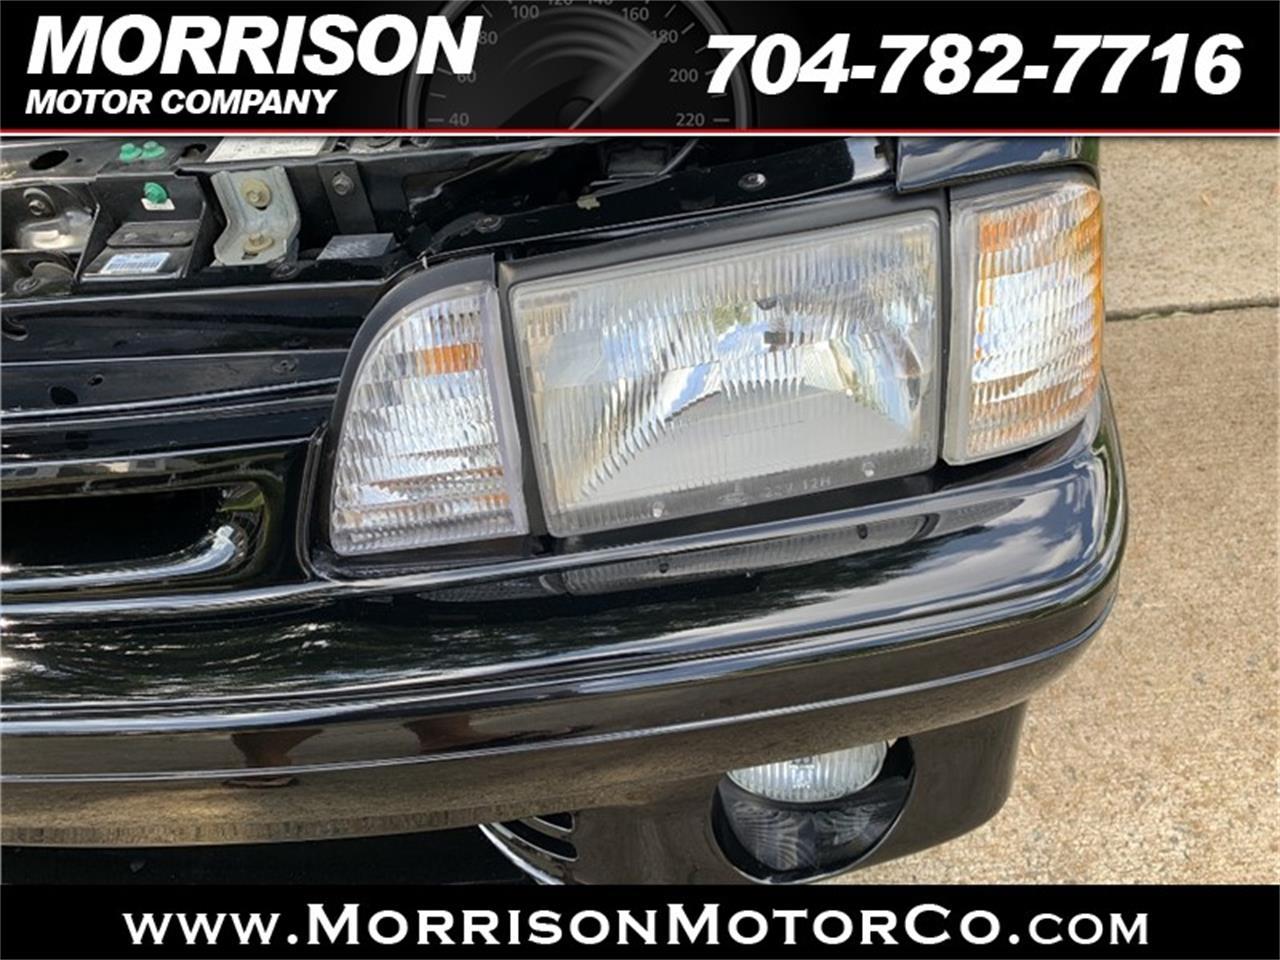 1993 Ford Mustang Cobra (CC-1388600) for sale in Concord, North Carolina